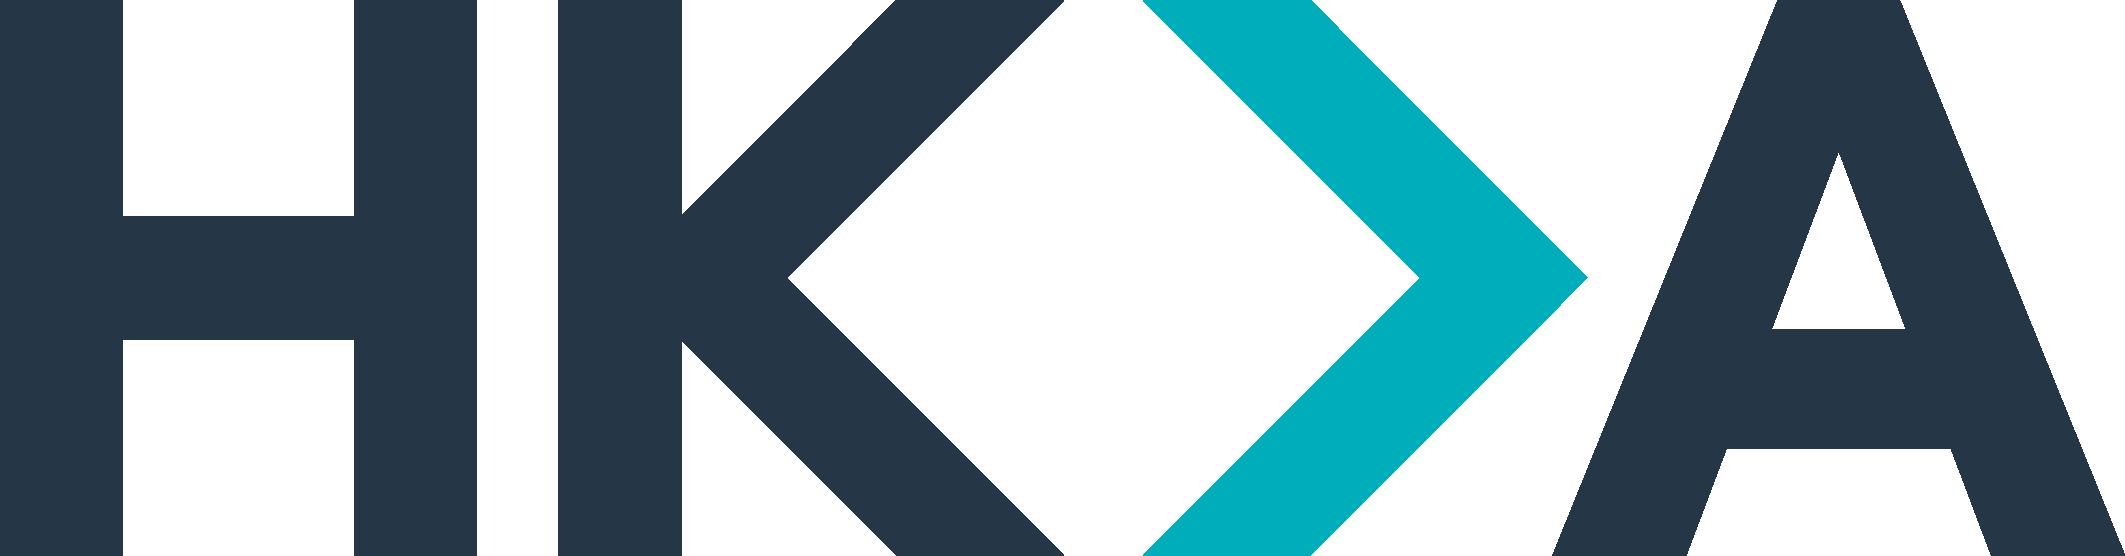 HKA-Logo-PMS